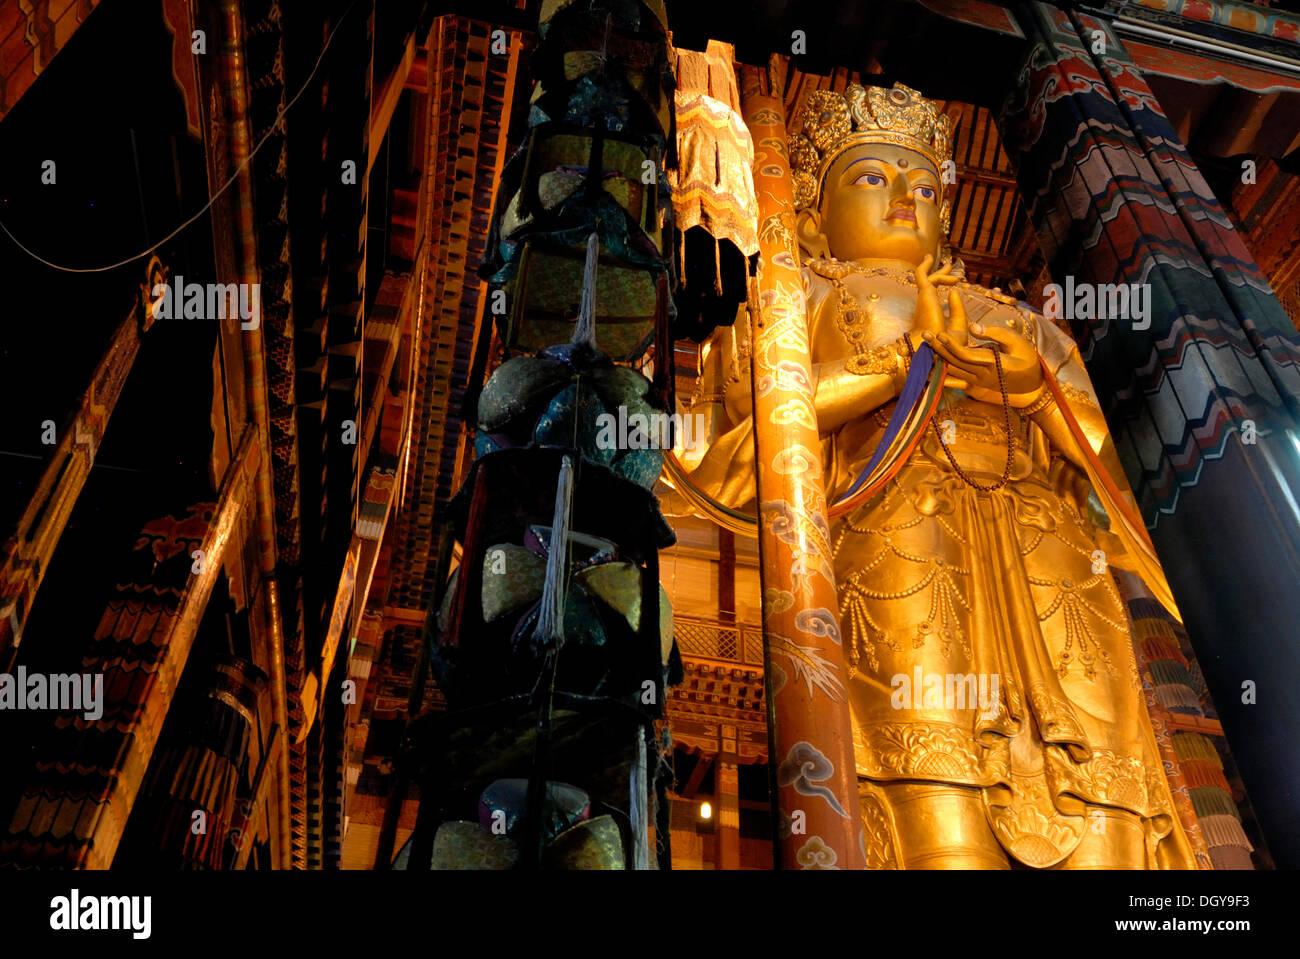 26-metro-alta statua della dea Janraisig, Sanscrito Avalokiteshvara, Monastero Gandan, Migjid Janraisig Sueme, Gandan Khiid Immagini Stock